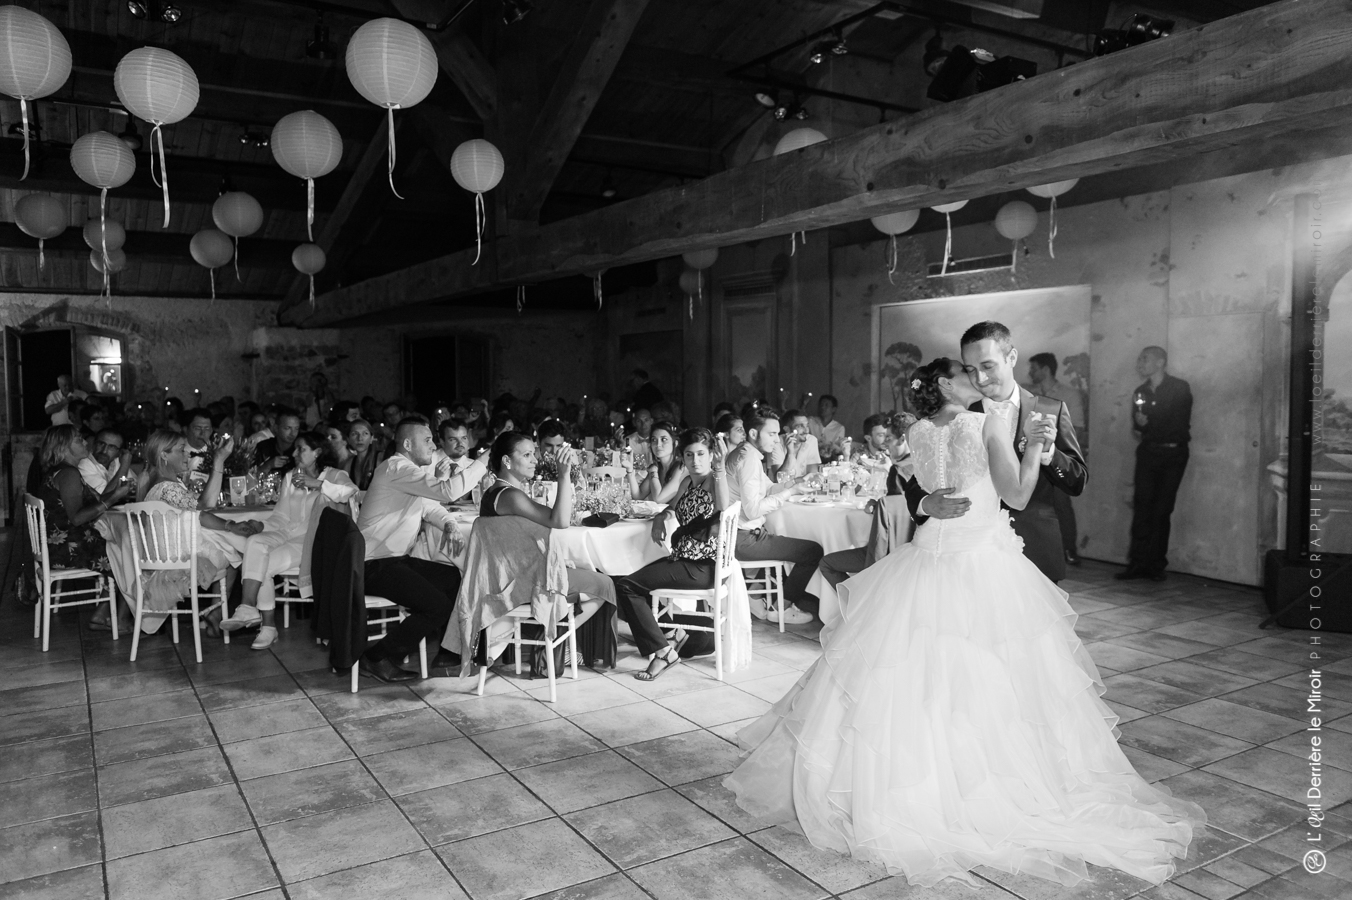 mariage-cj-vaugrenier-loeilderrierelemiroir-093